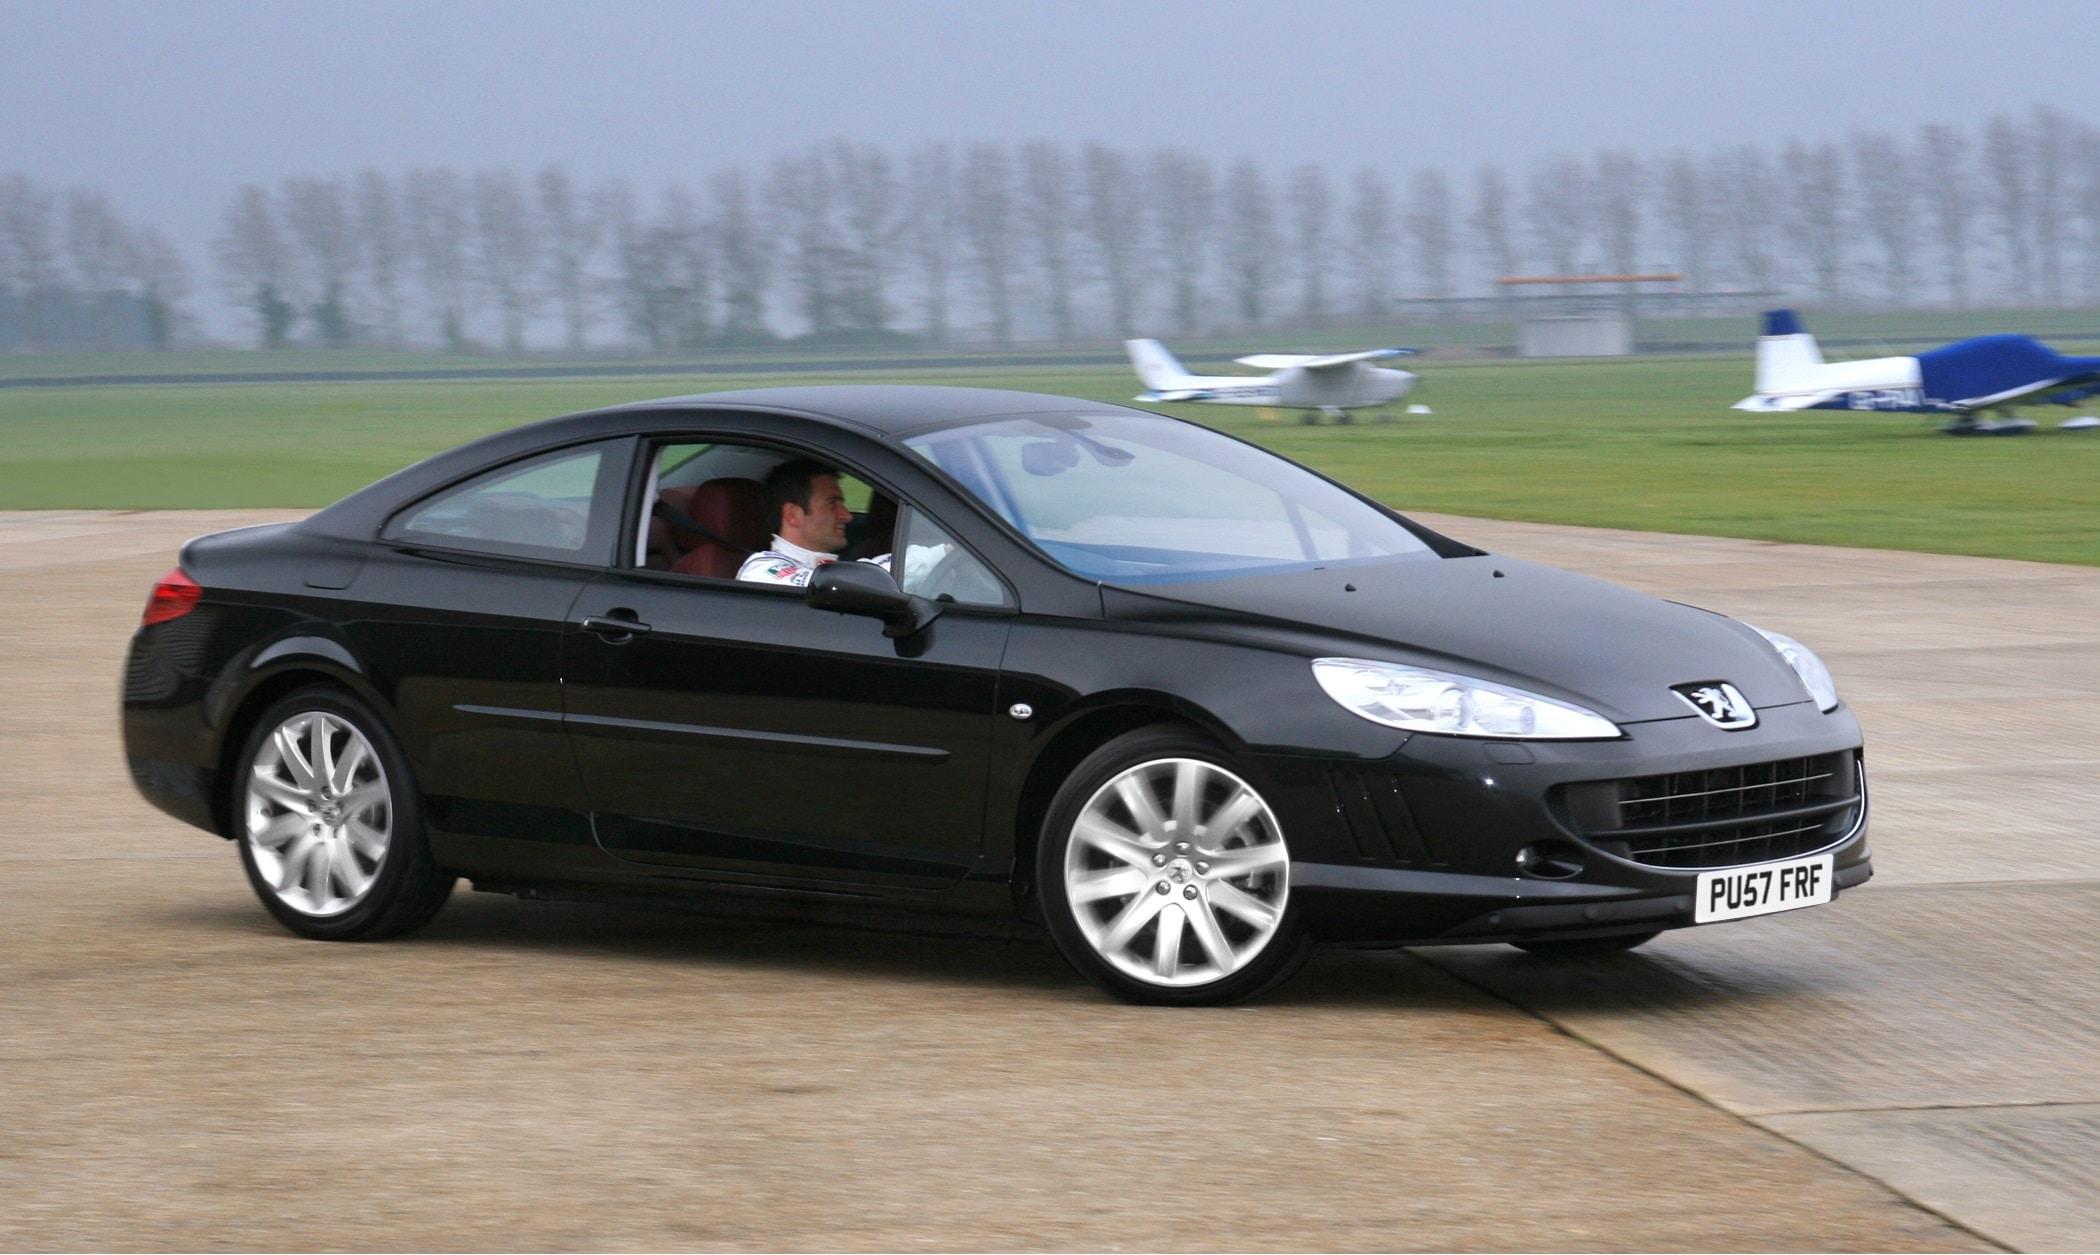 peugeot 407 coupe, peugeot 407, 407 coupe, peugeot, french, psa, psa group, motoring, automotive, classic car, retro car, car sales, cheap car, diesel, petrol, motoring, automotive, car, cars